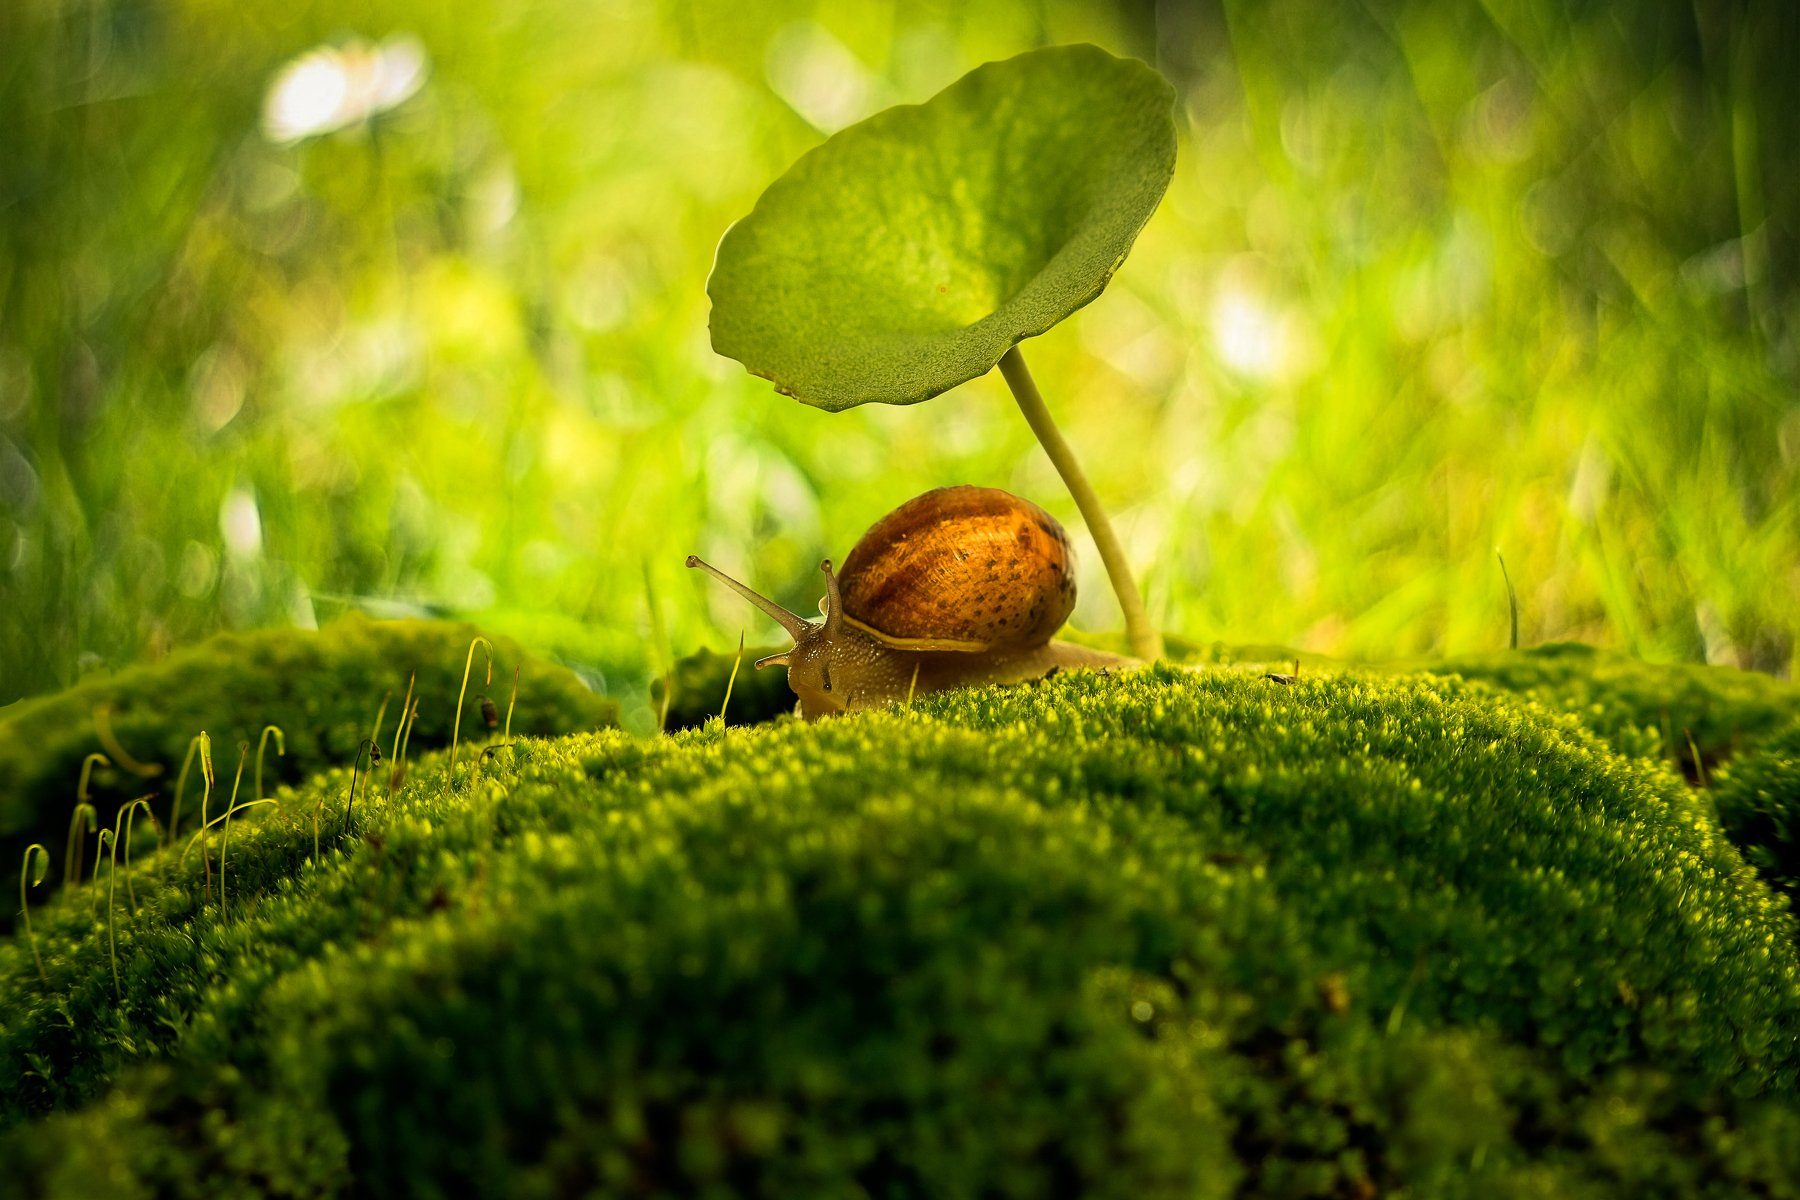 snail, moss, macro, green, nature, close-up, ground, morning, center, Улитка, мох, макро, зеленый, природа, крупный план, земля, утро, центр, Antonio Bernardino